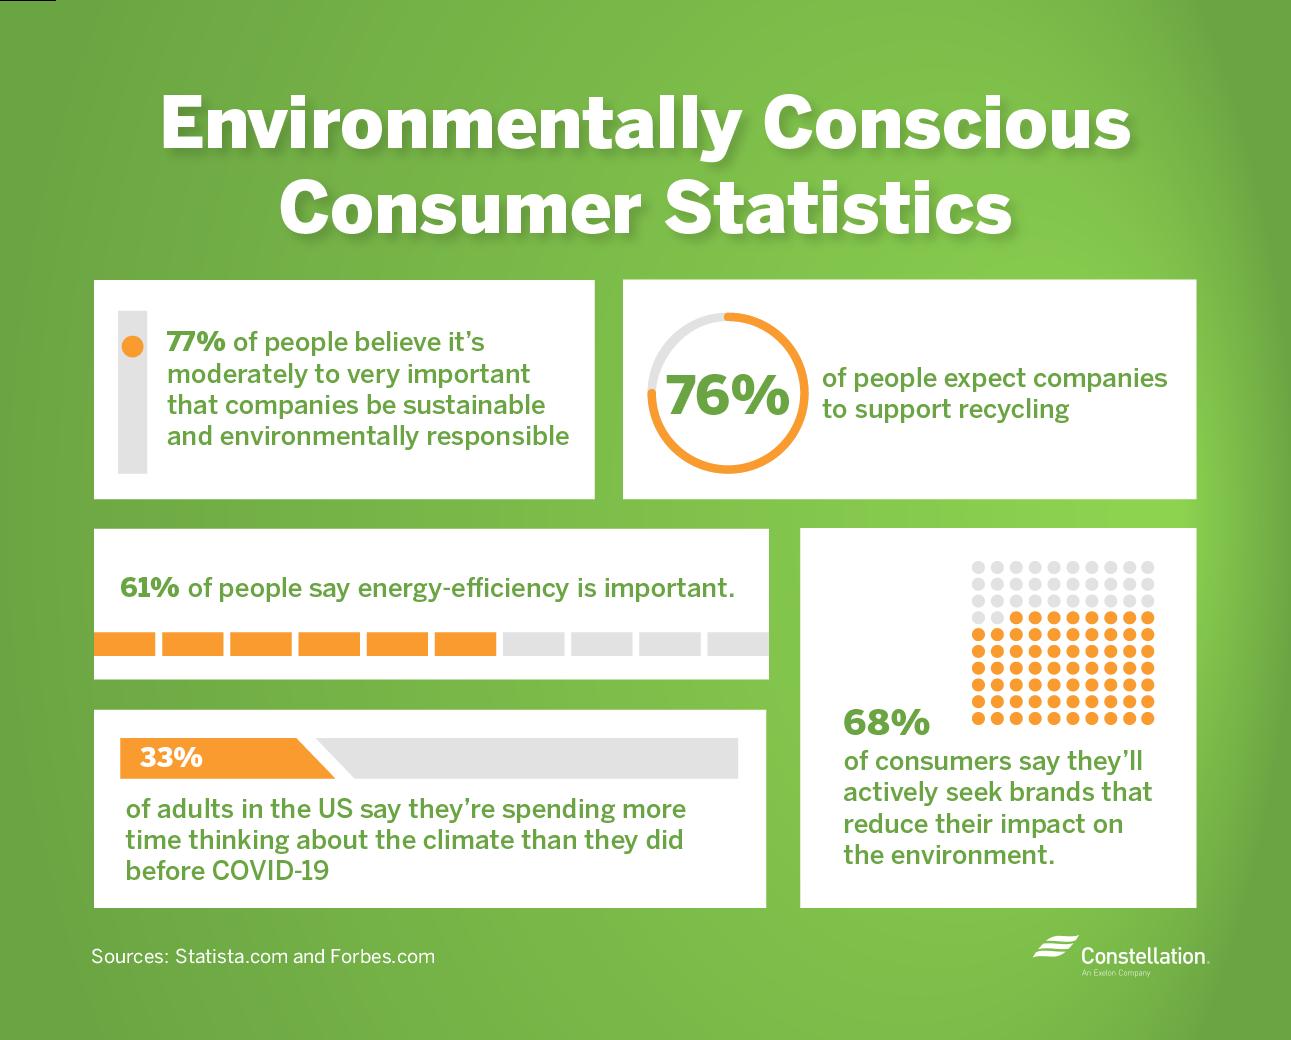 Environmentally conscious consumers statistics